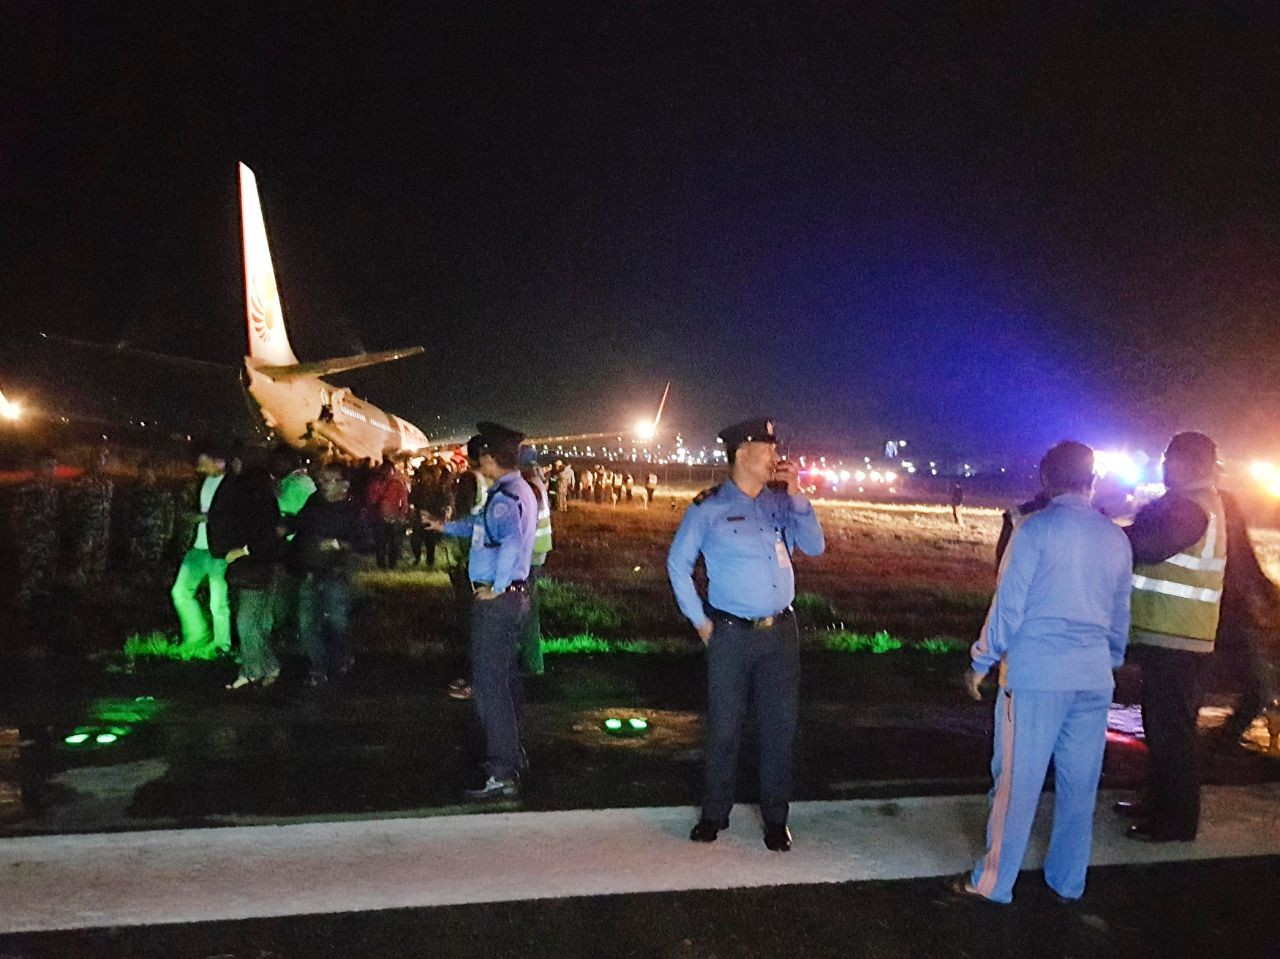 Malindo Air flight suffers runway excursion in Kathmandu